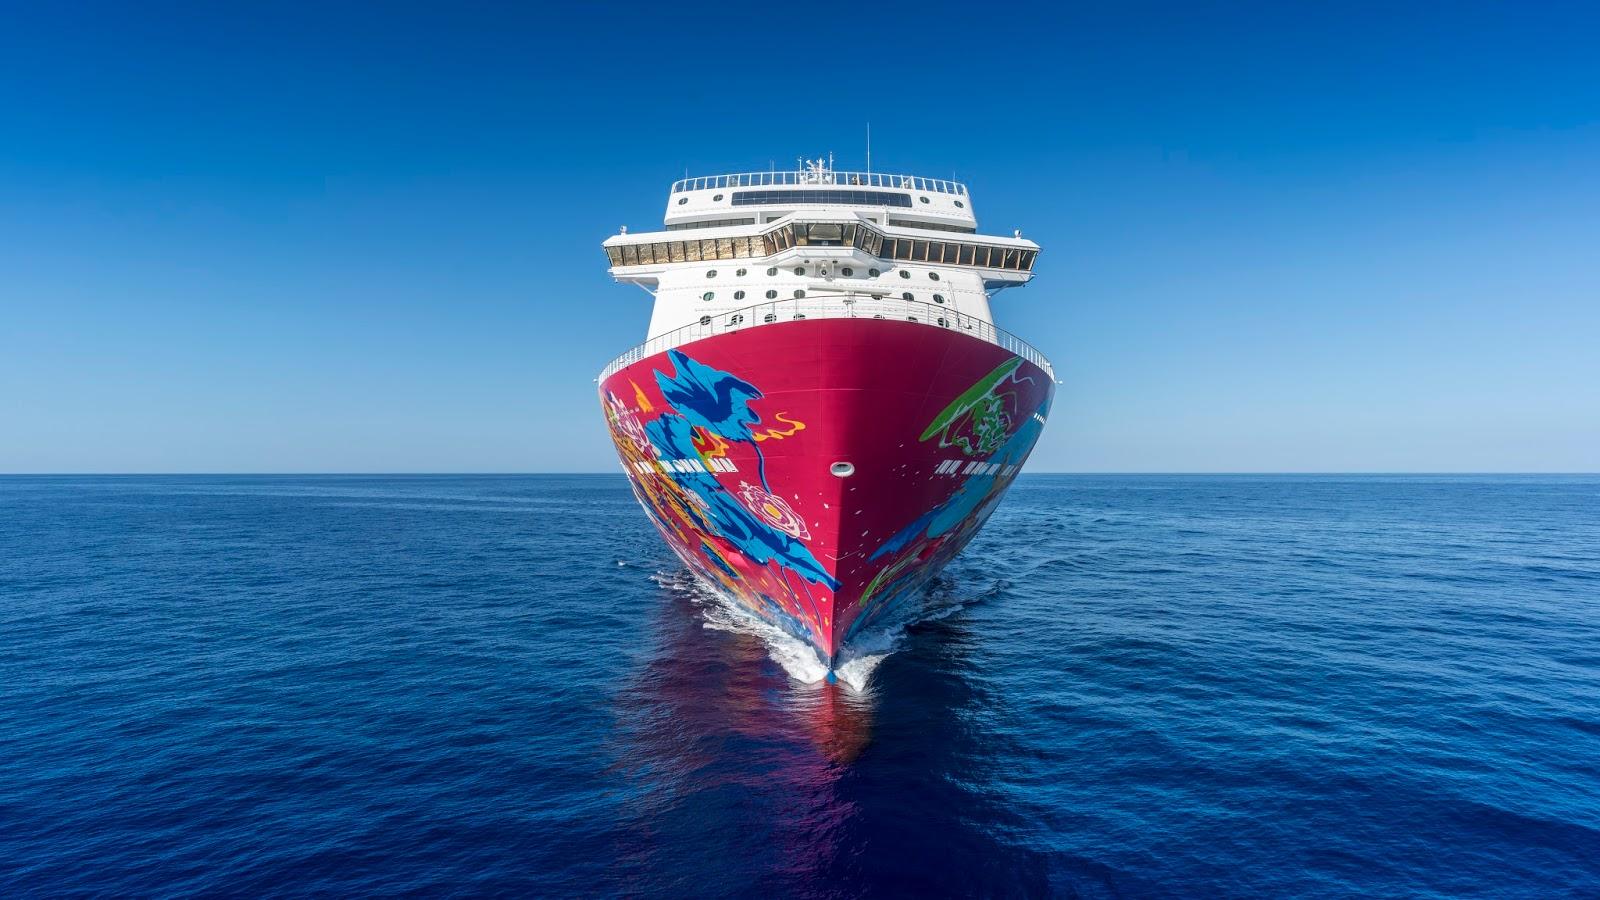 Shaun Owyeong Arrival Of The DREAM CRUISES - The dream cruise ship